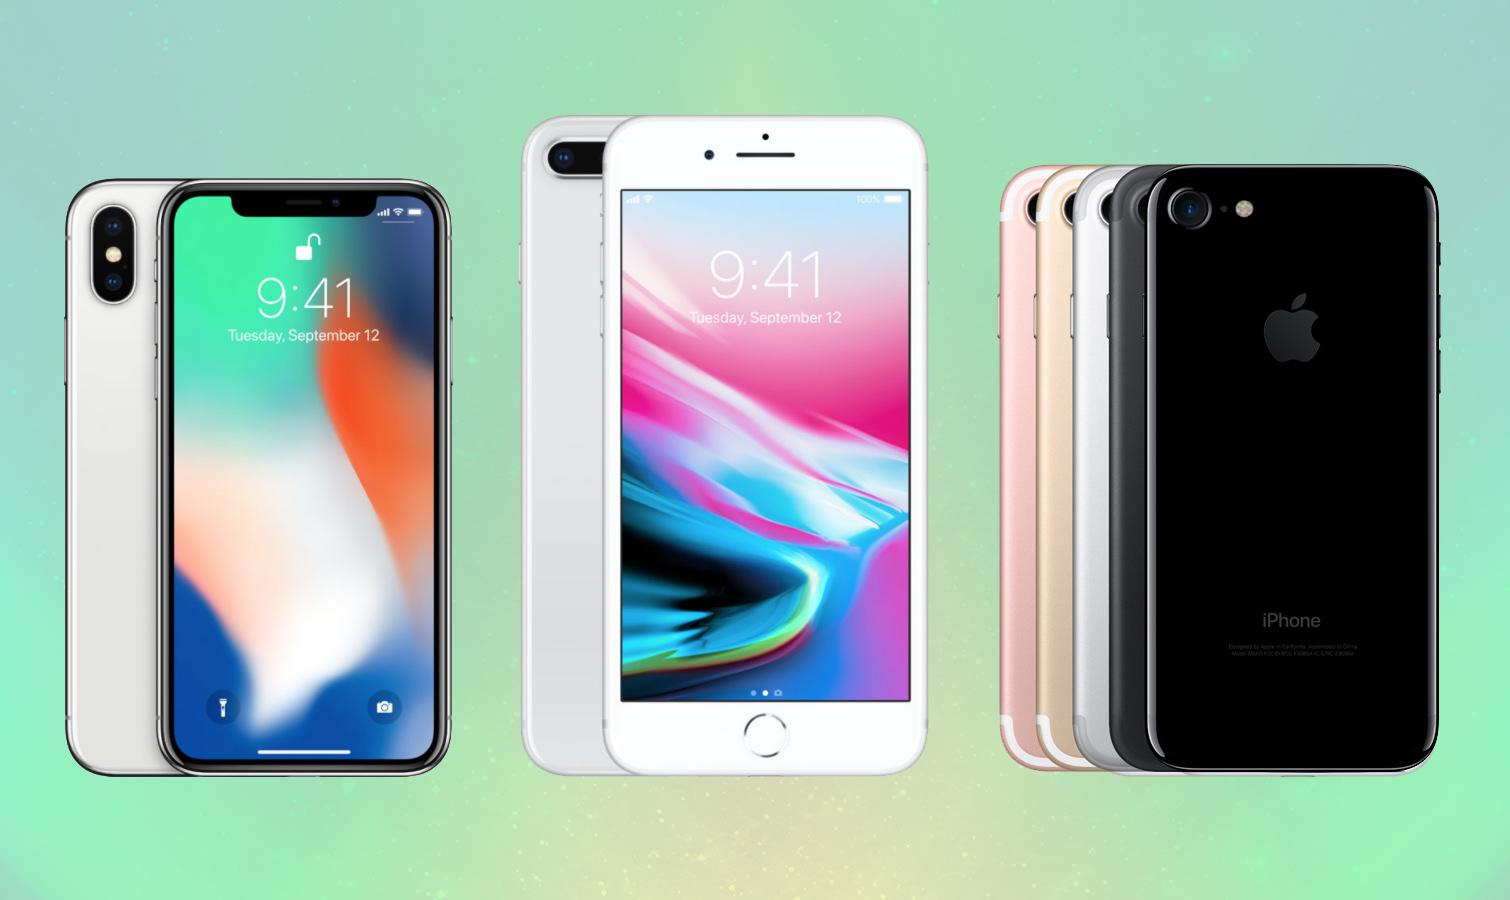 Come avviare modalità DFU su iPhone 7, iPhone 8 e iPhone X